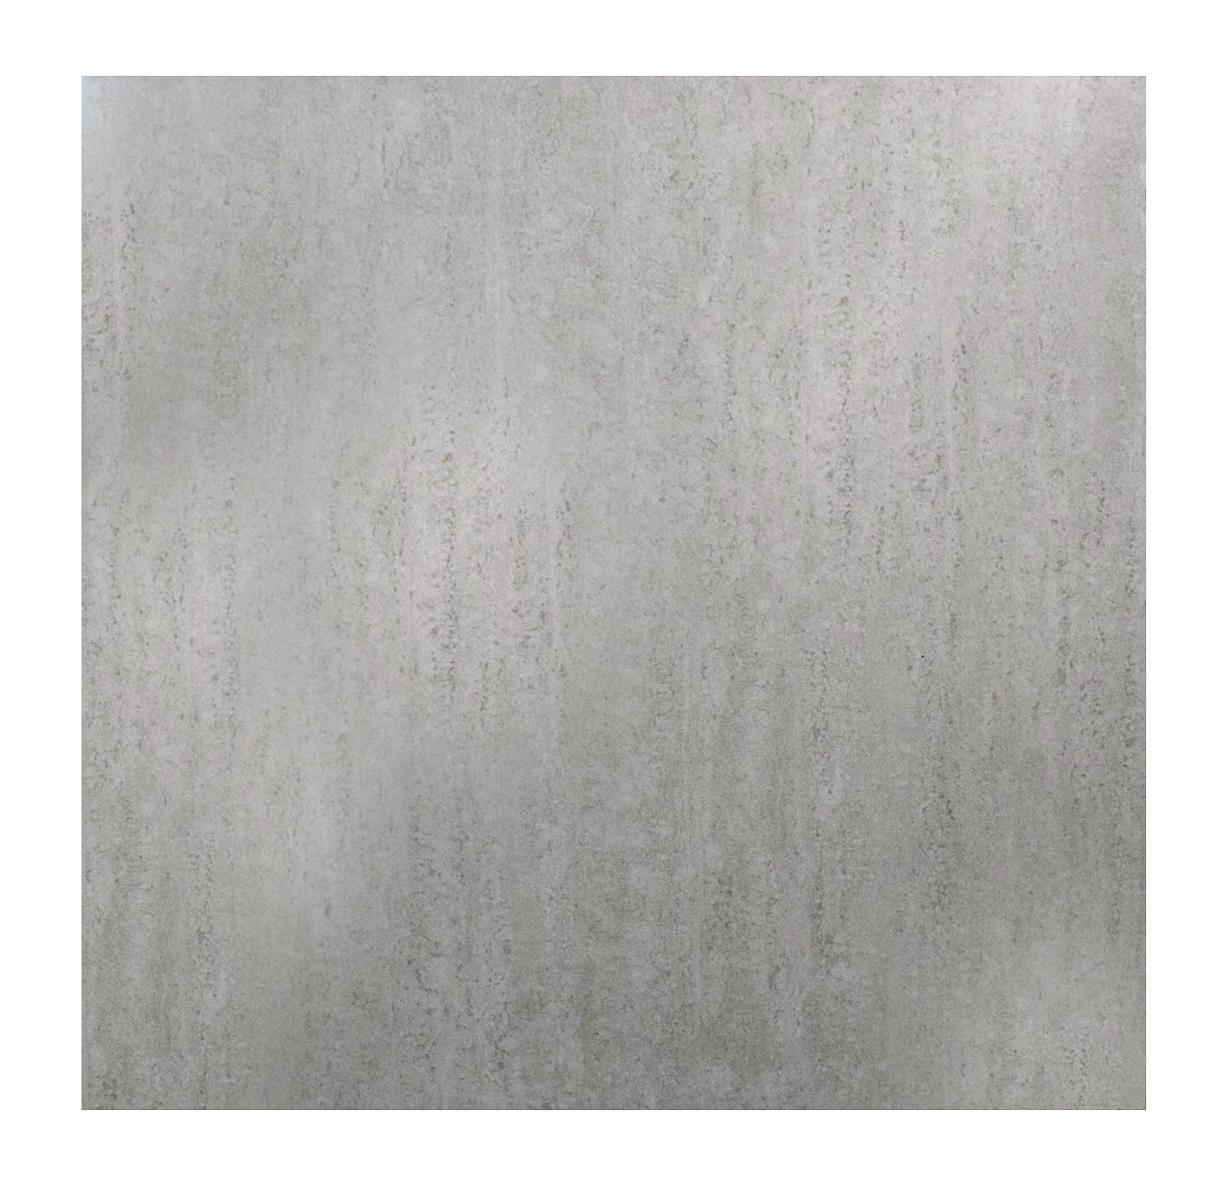 Vulcano off white 245 x 245 square porcelain floor tile vulcano off white 245 x 245 square porcelain floor tile dailygadgetfo Gallery